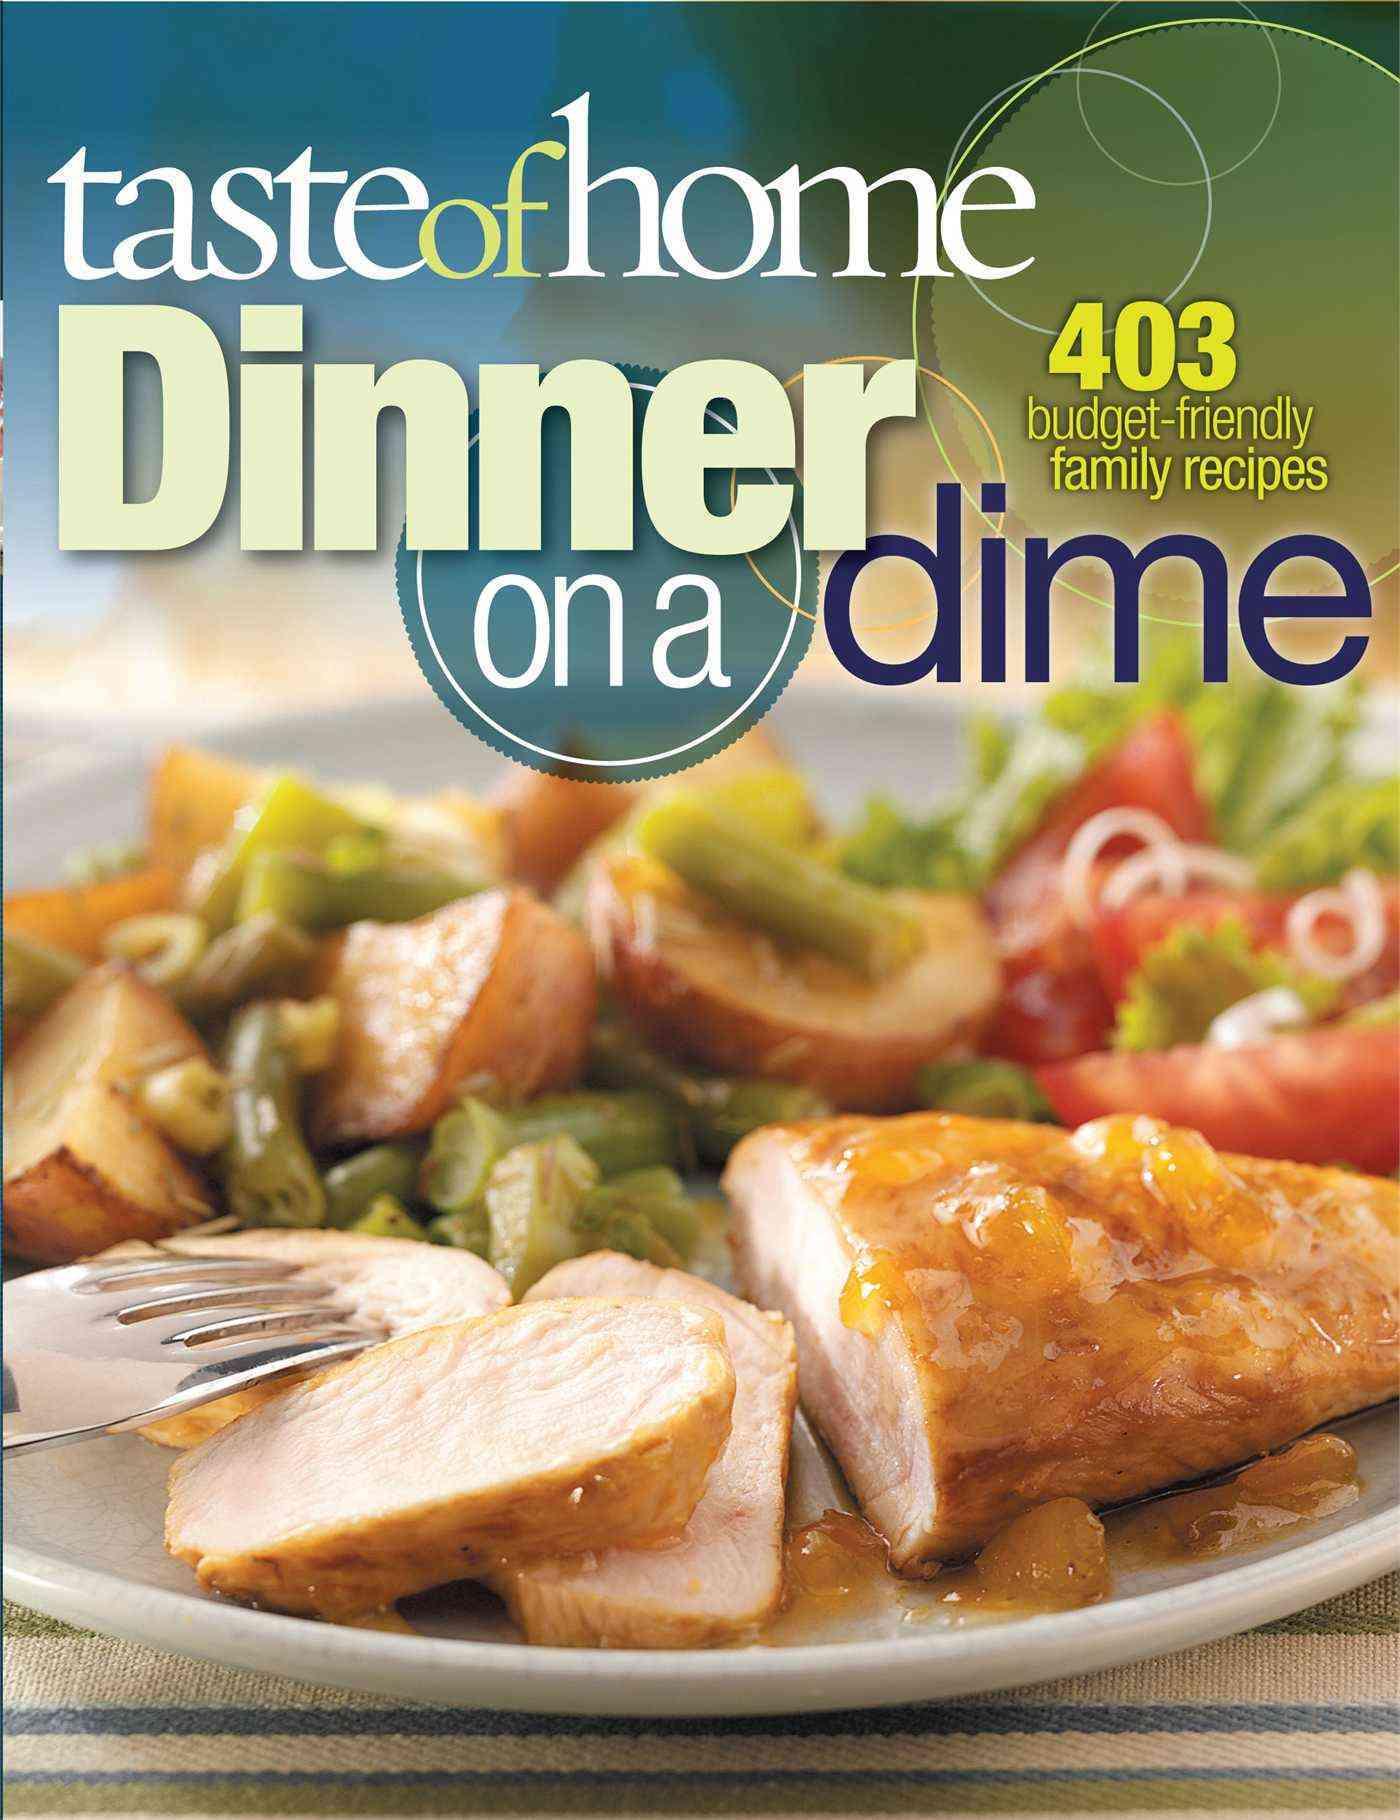 Taste of Home Dinner on a Dime (Paperback)